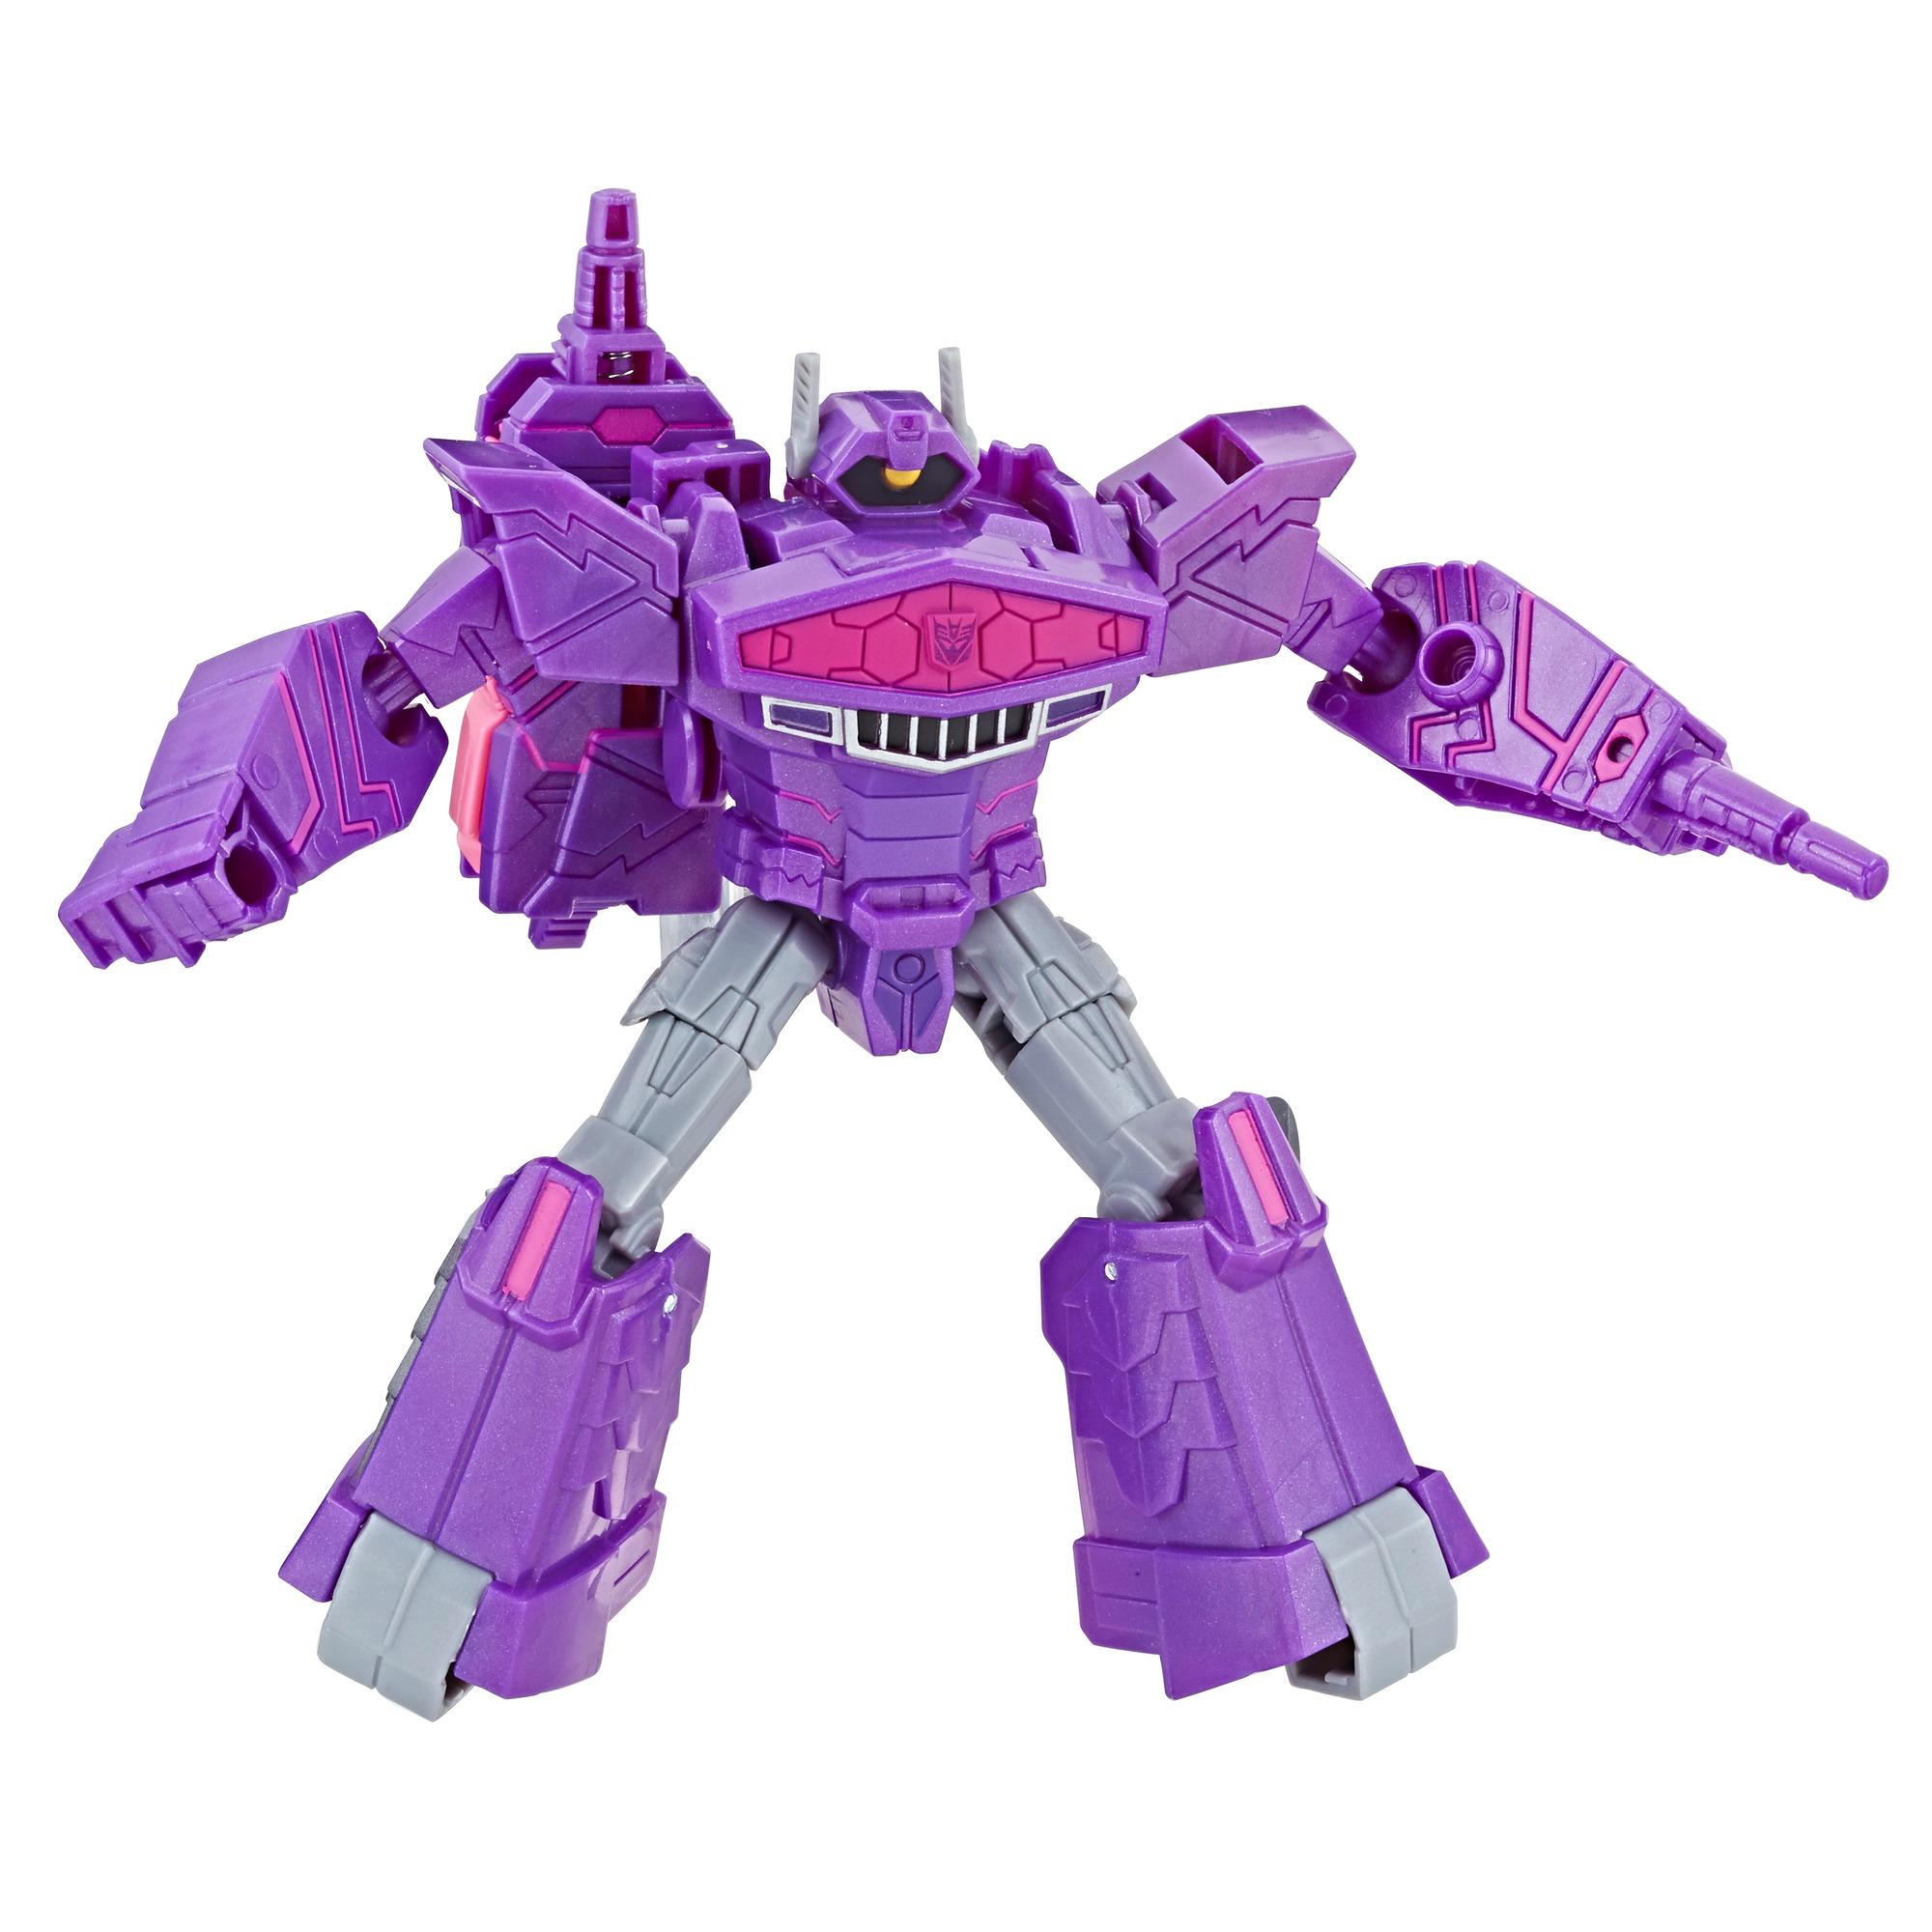 Transformers Cyberverse Warrior Class Decepticon Shockwave